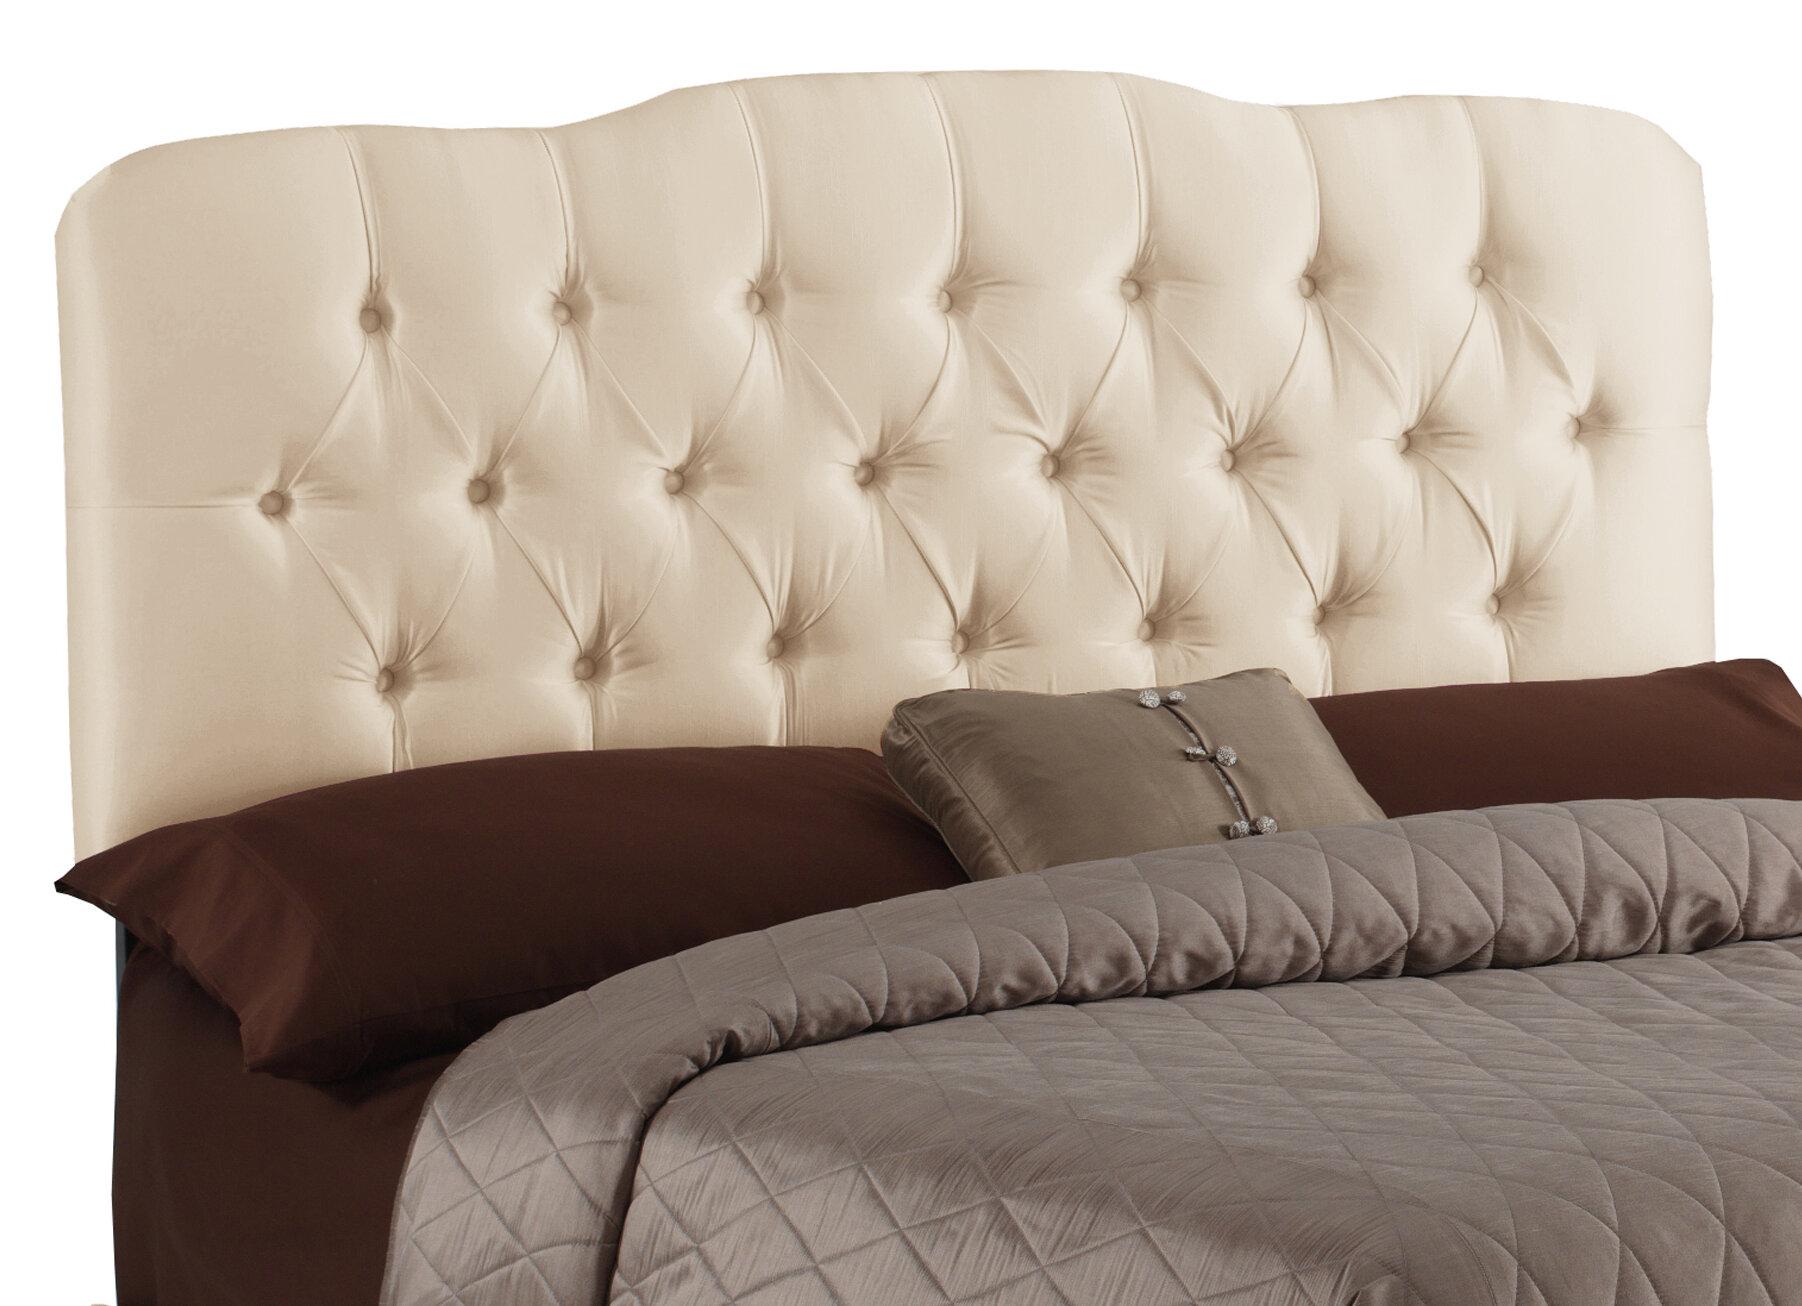 Wayfair Tufted Headboard Find Headboards Wayfair: Skyline Furniture Carnaby Tufted Shantung Parchment